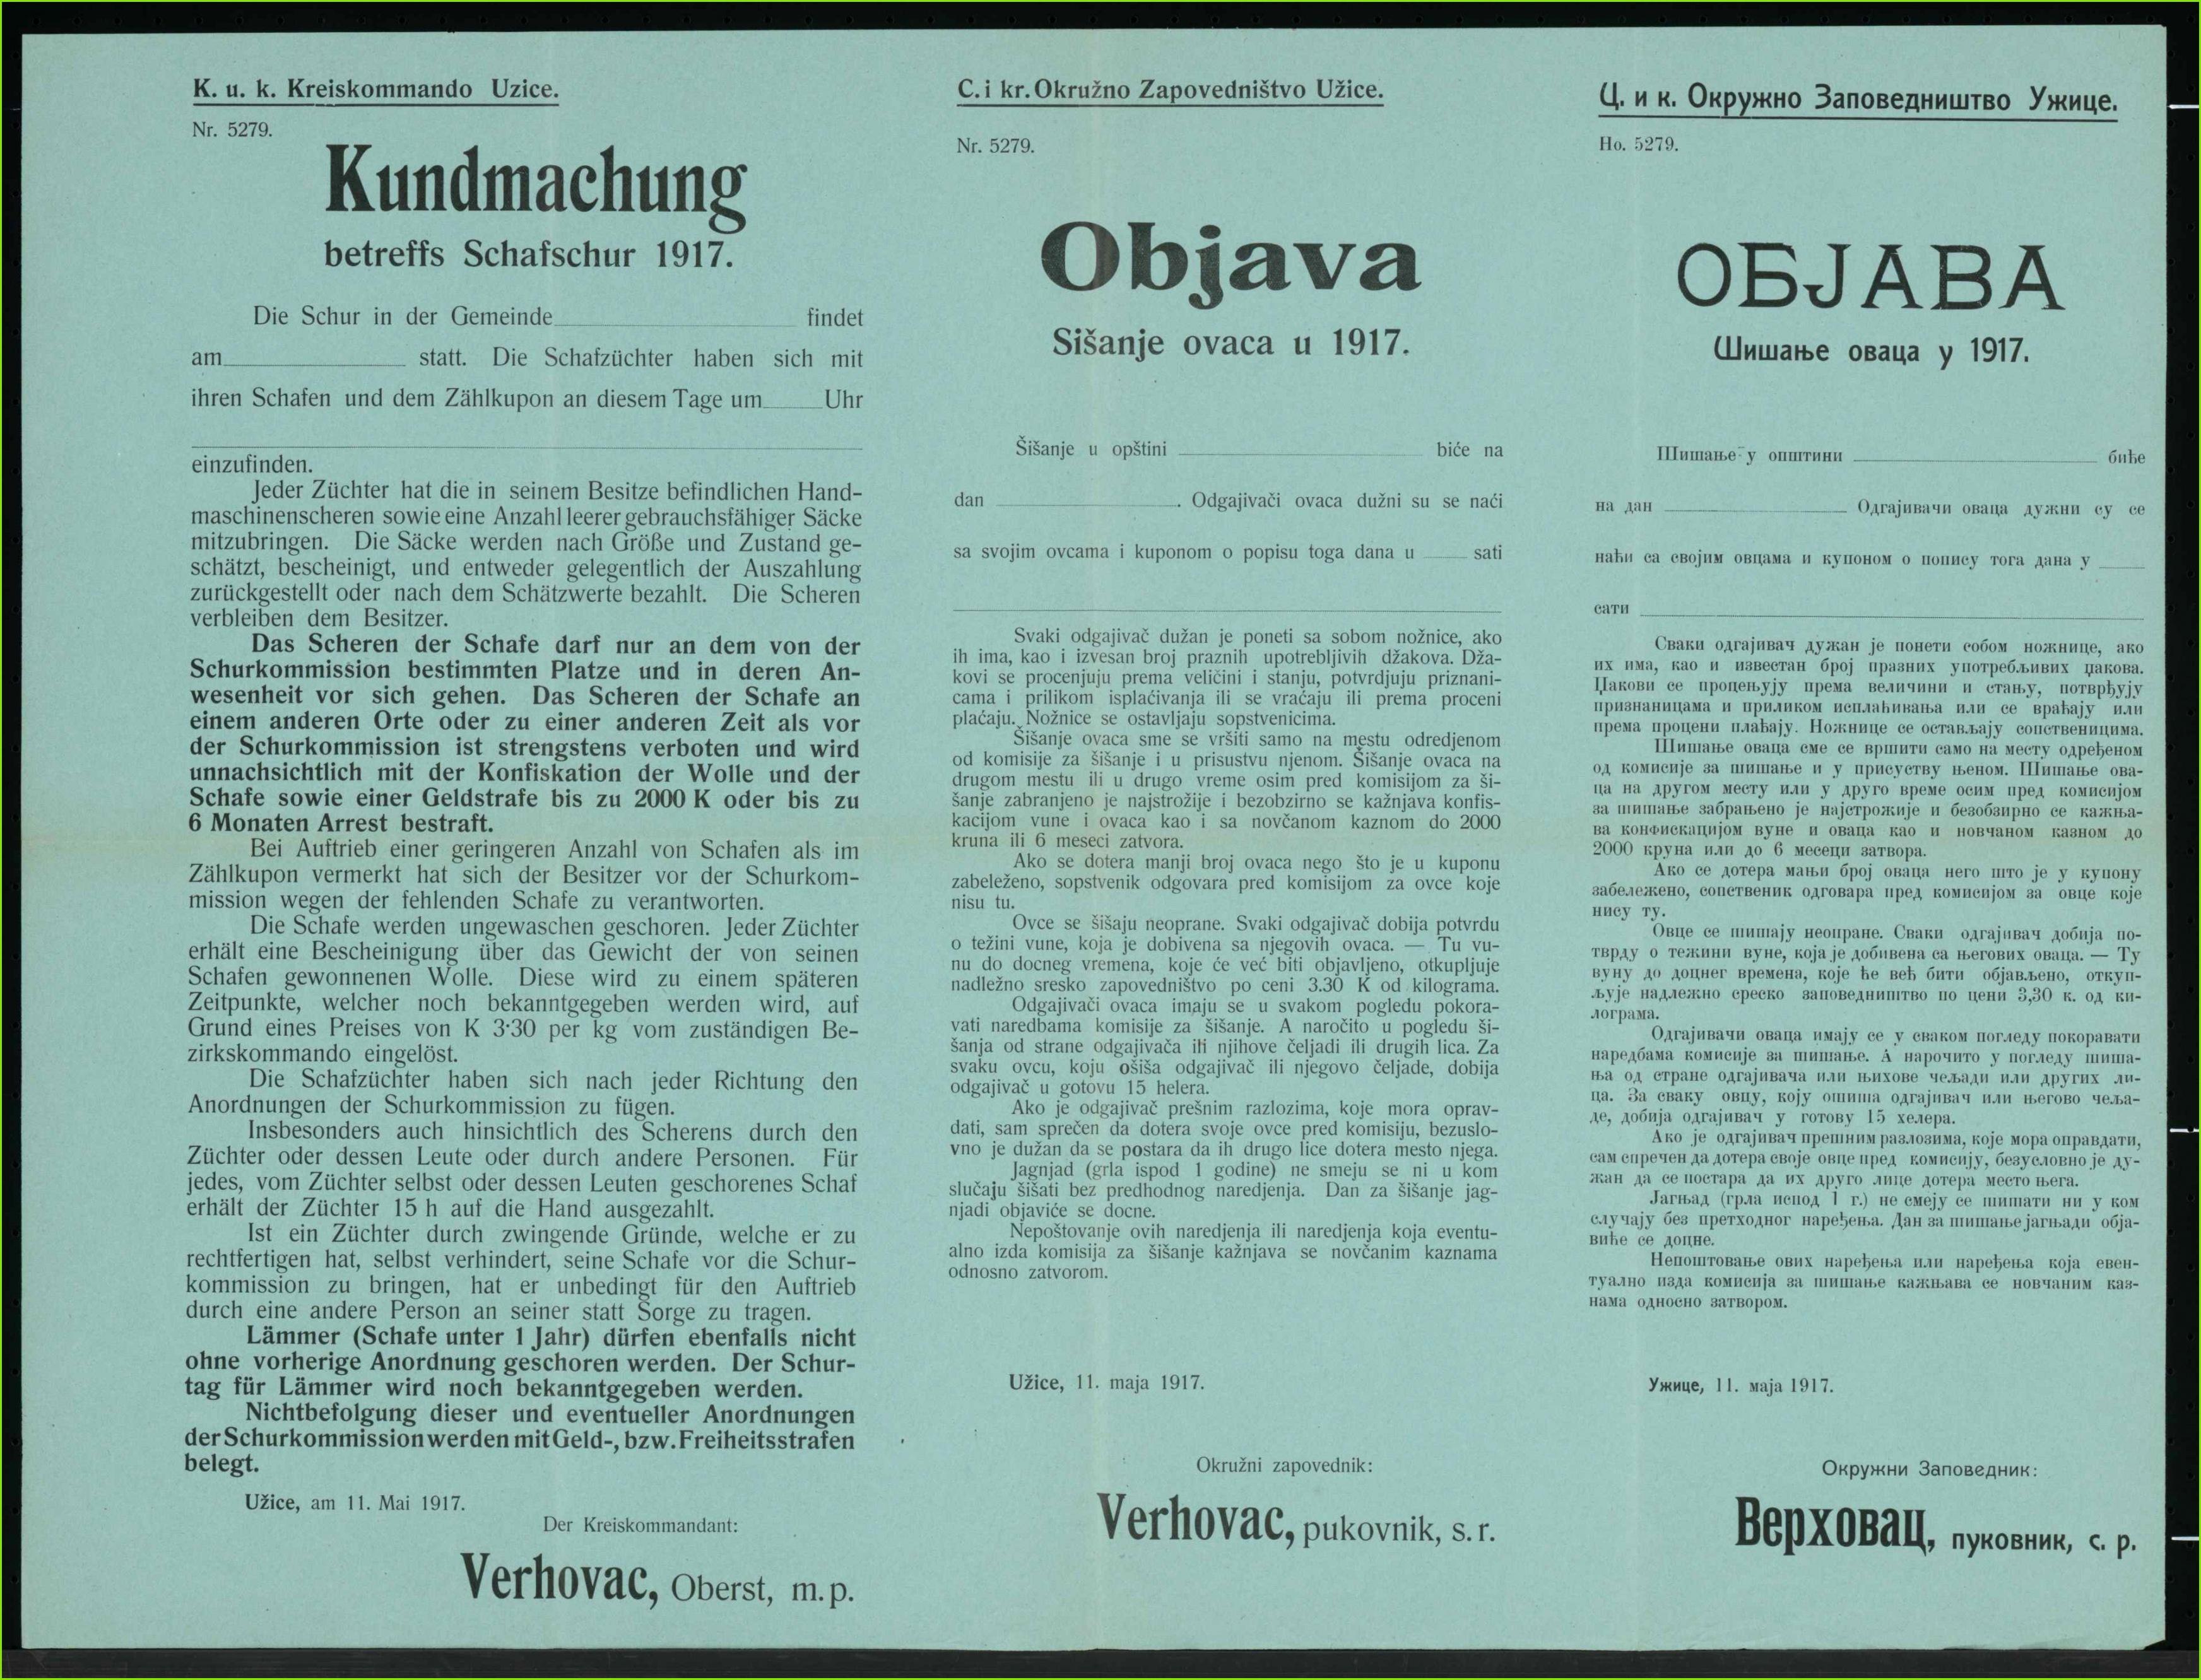 vordruck geml schafschur 1917 kundmachung uzice mehrsprachiges plakat 7d205b